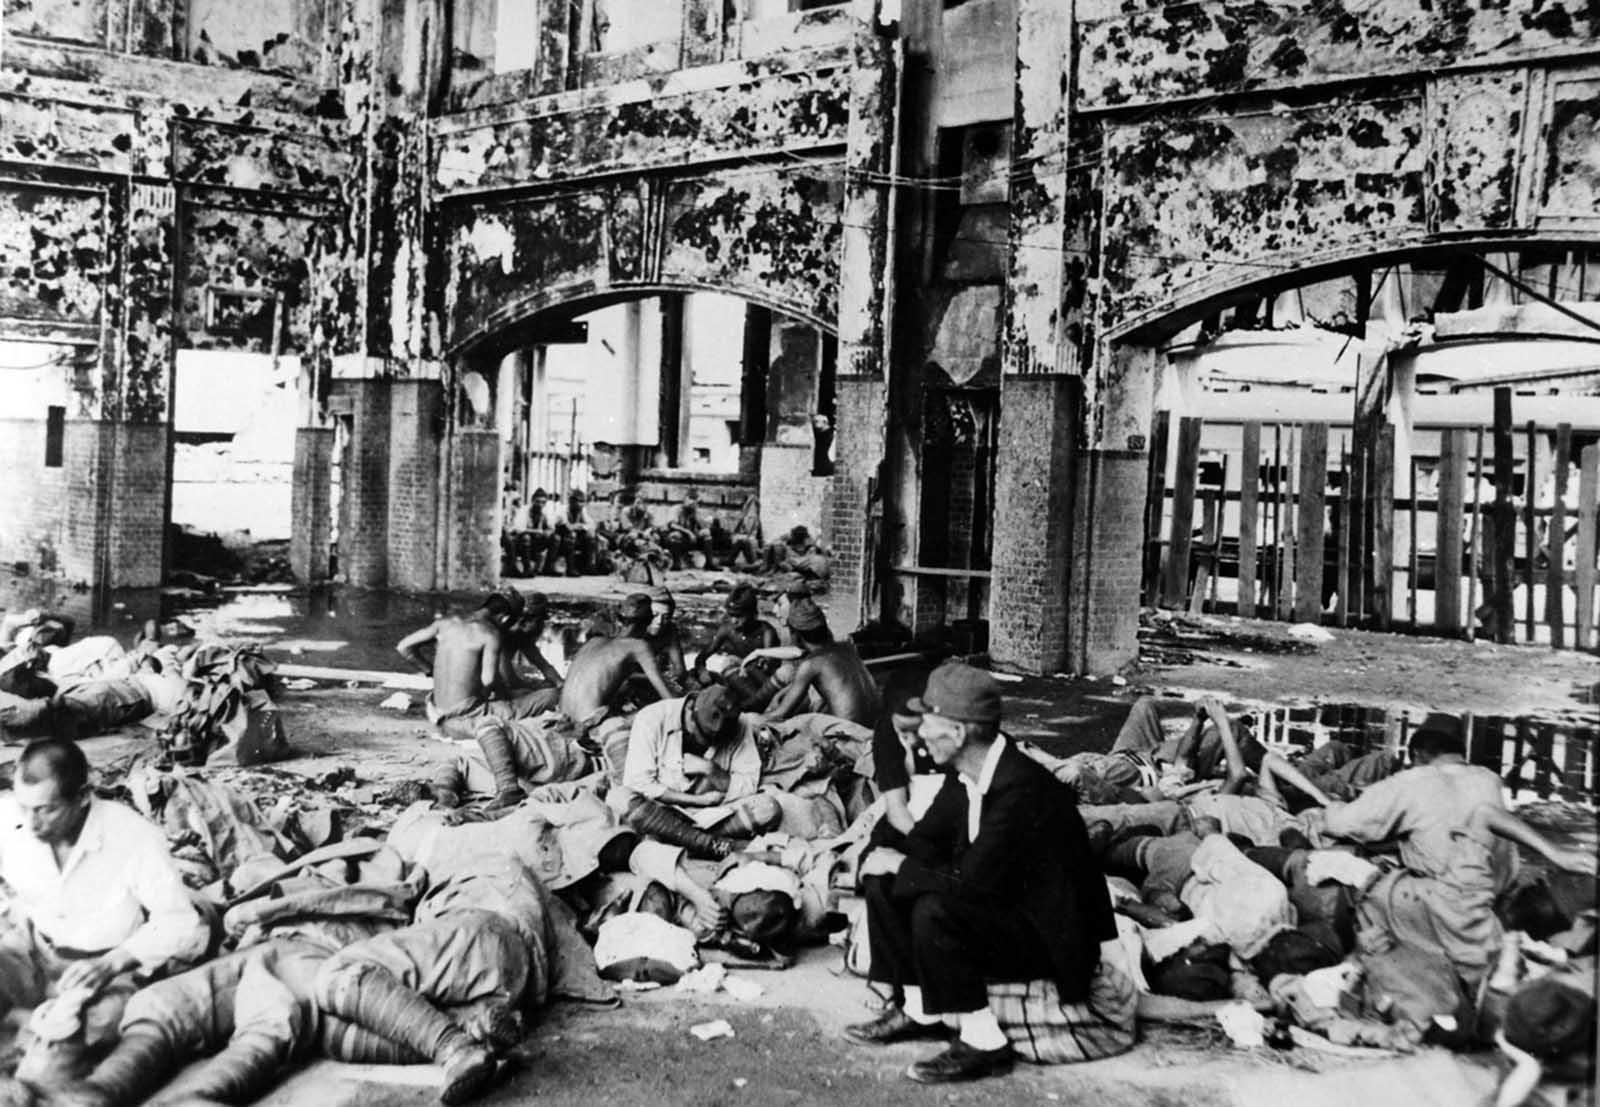 Hiroshima_before_after_atomic_bomb (12).jpg